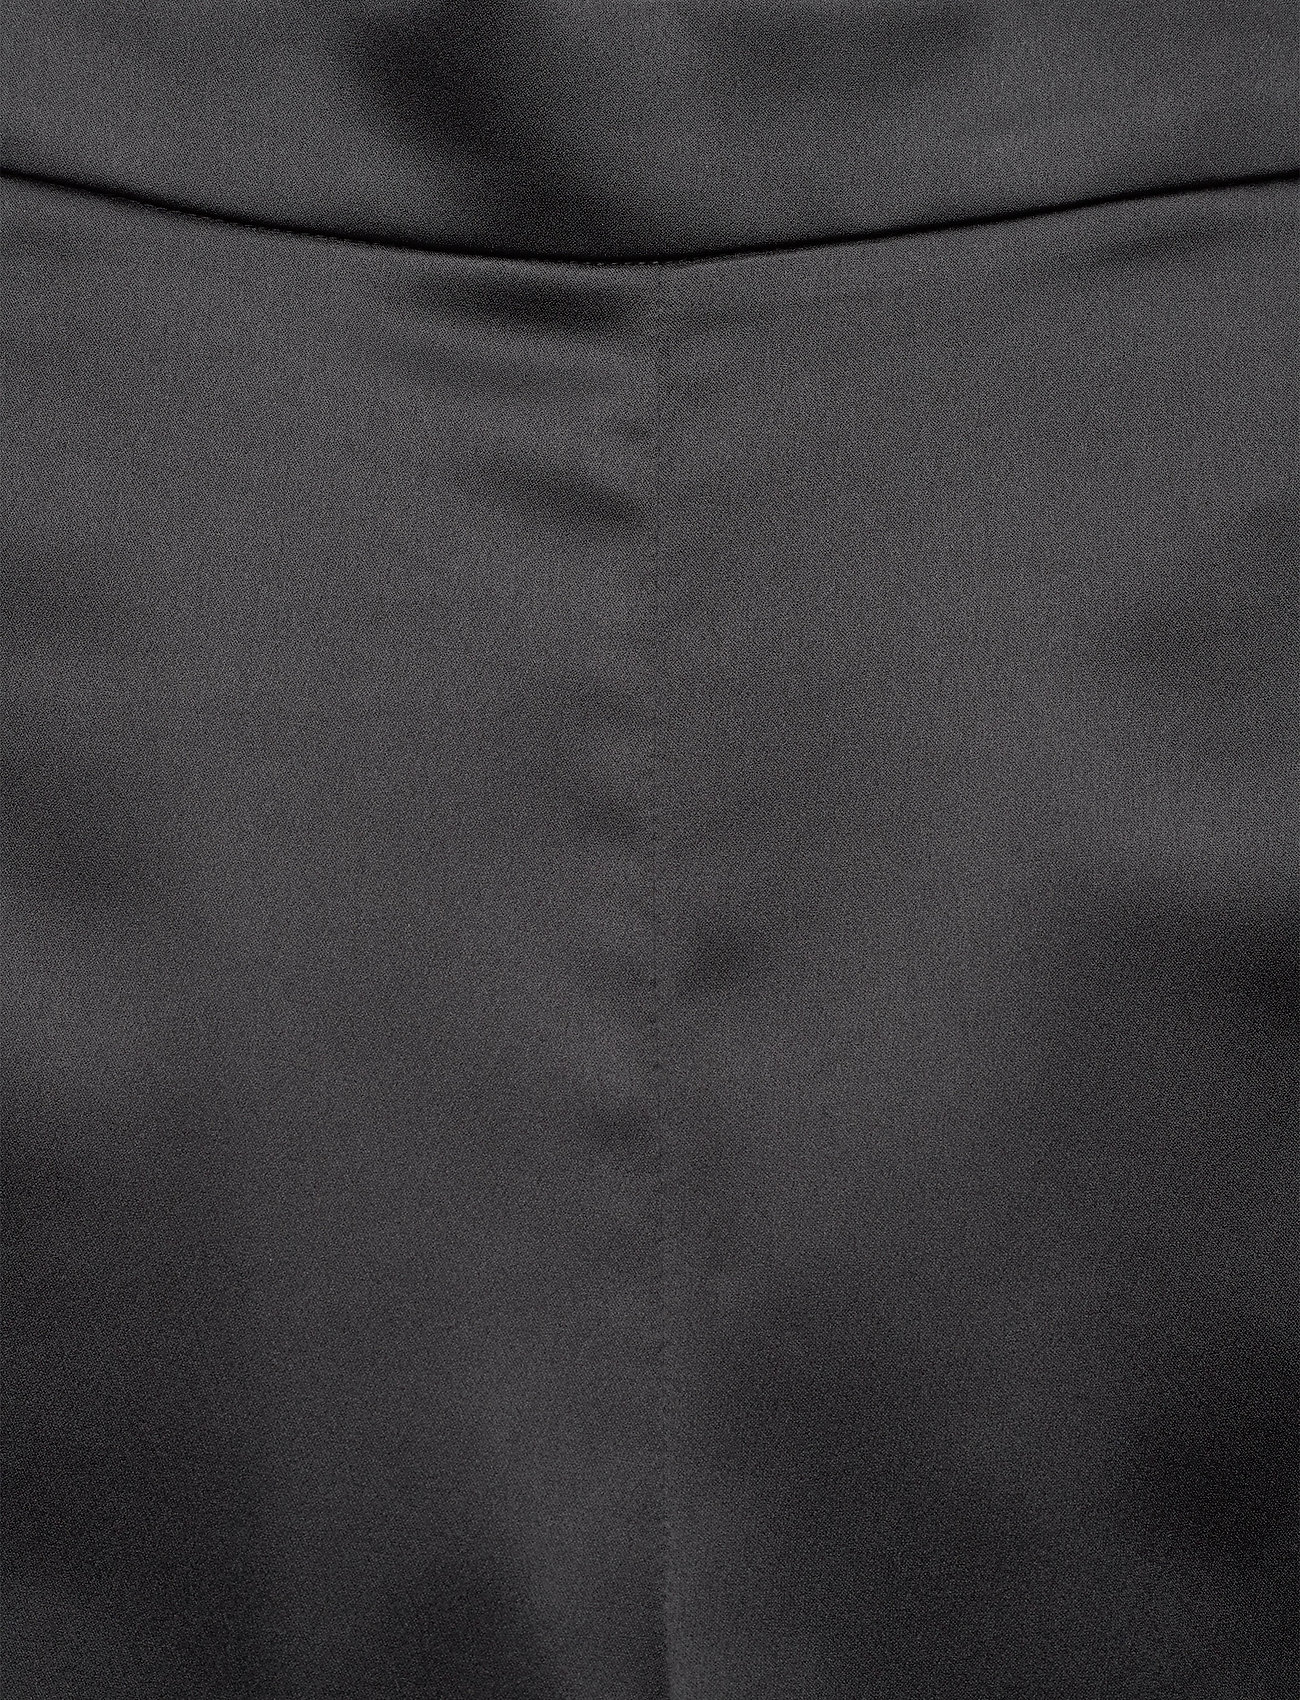 Max Mara Leisure - ENFASI - straight leg trousers - black - 3